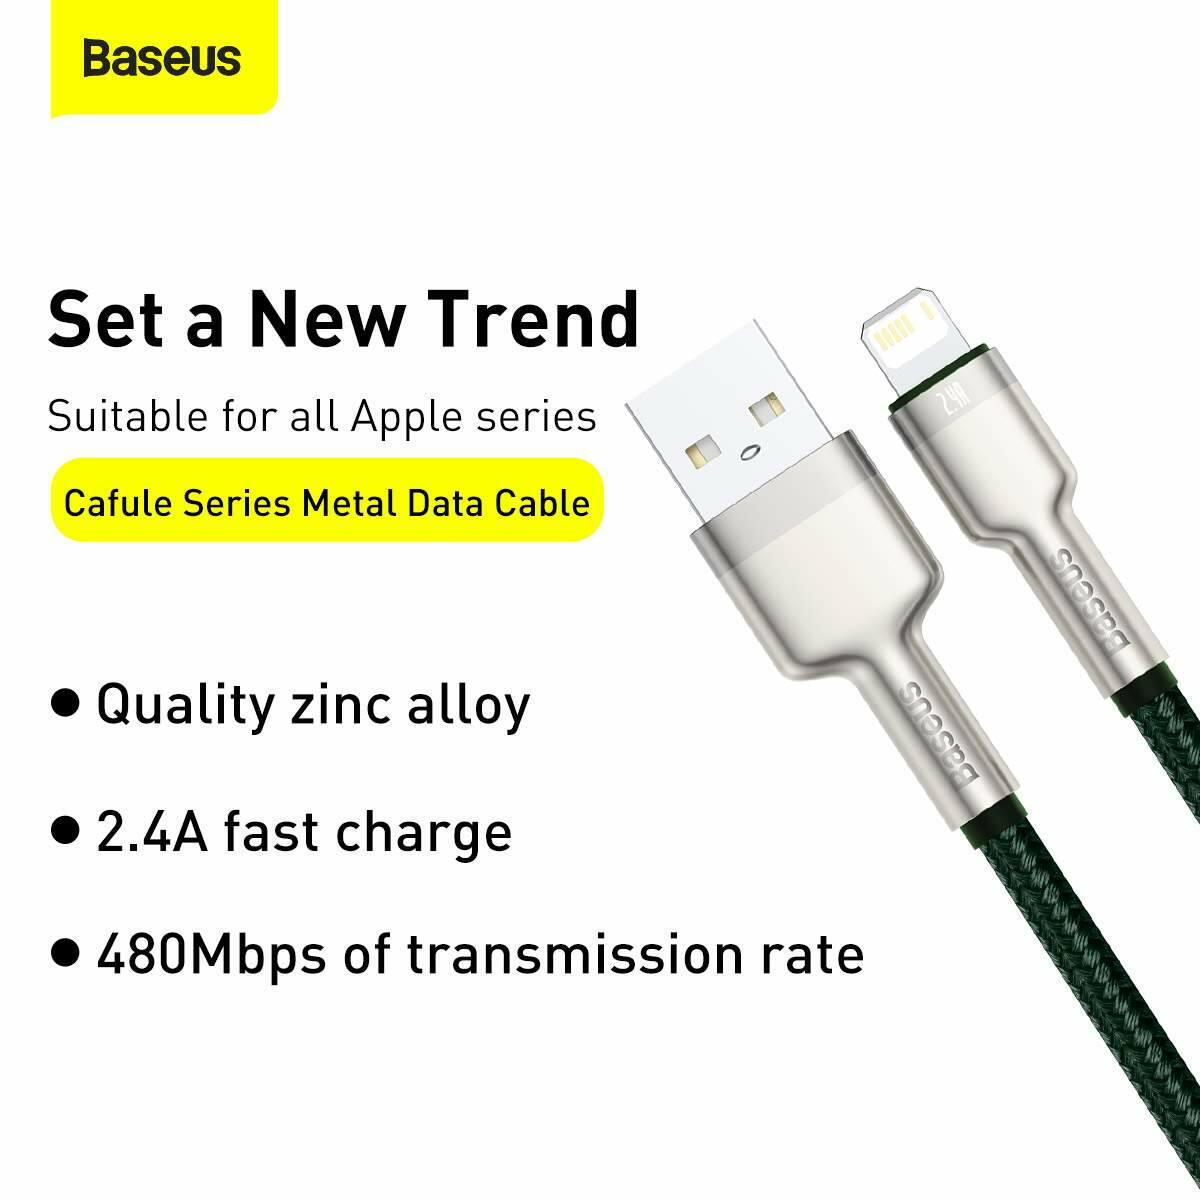 Baseus Lightning kábel, Cafule Series Metal adatkábel, 2.4A, 1m, zöld (CALJK-A06)